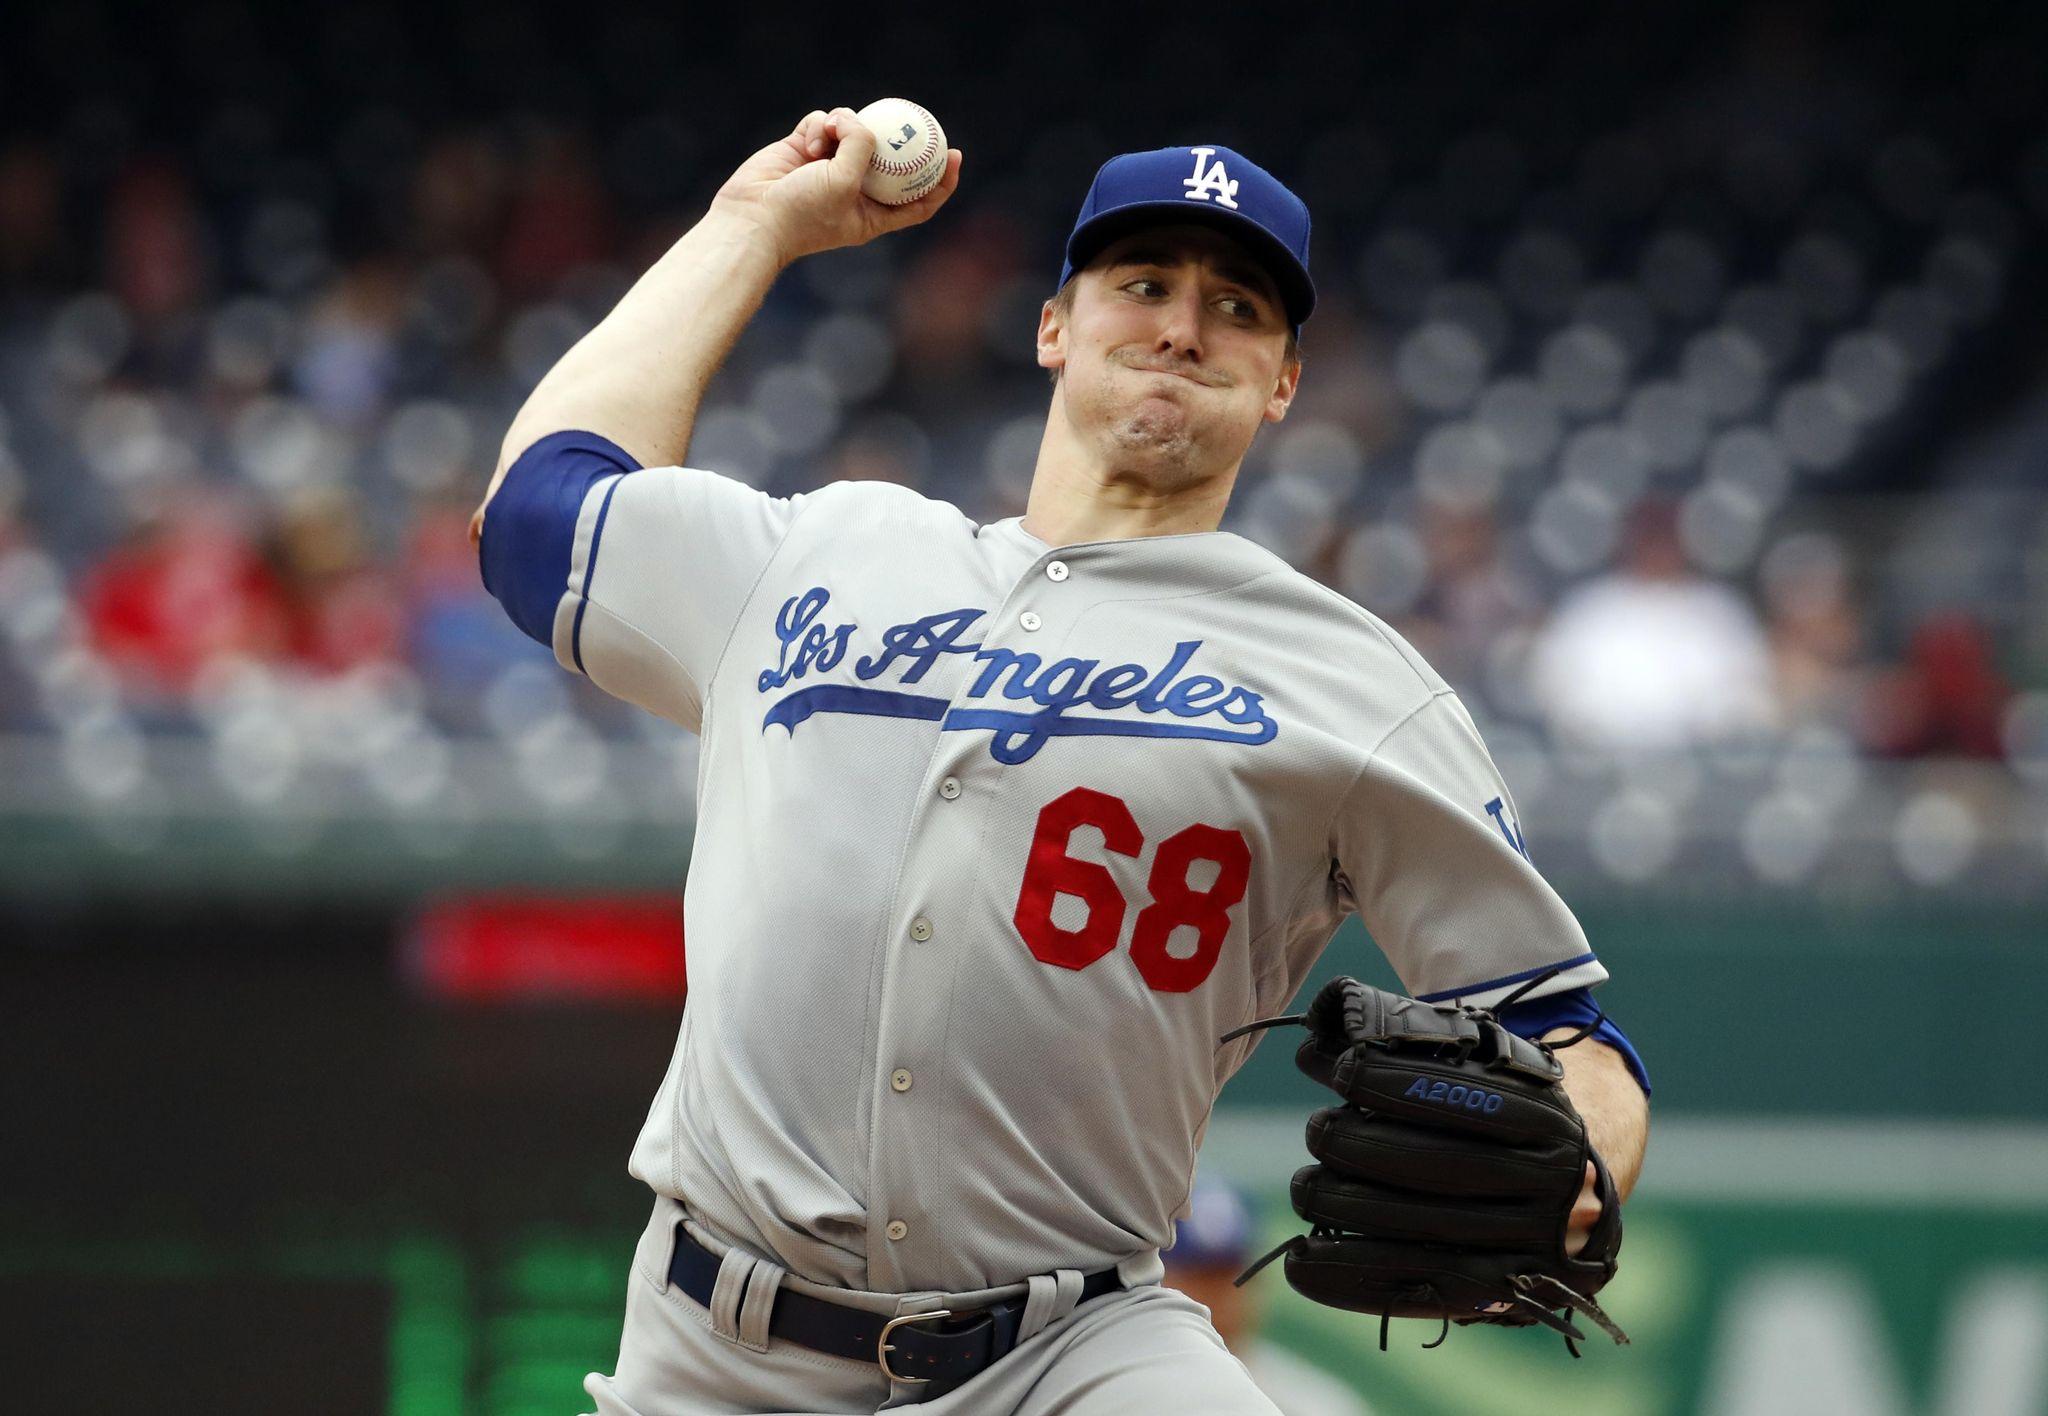 Dodgers_nationals_baseball_04947_s2048x1416